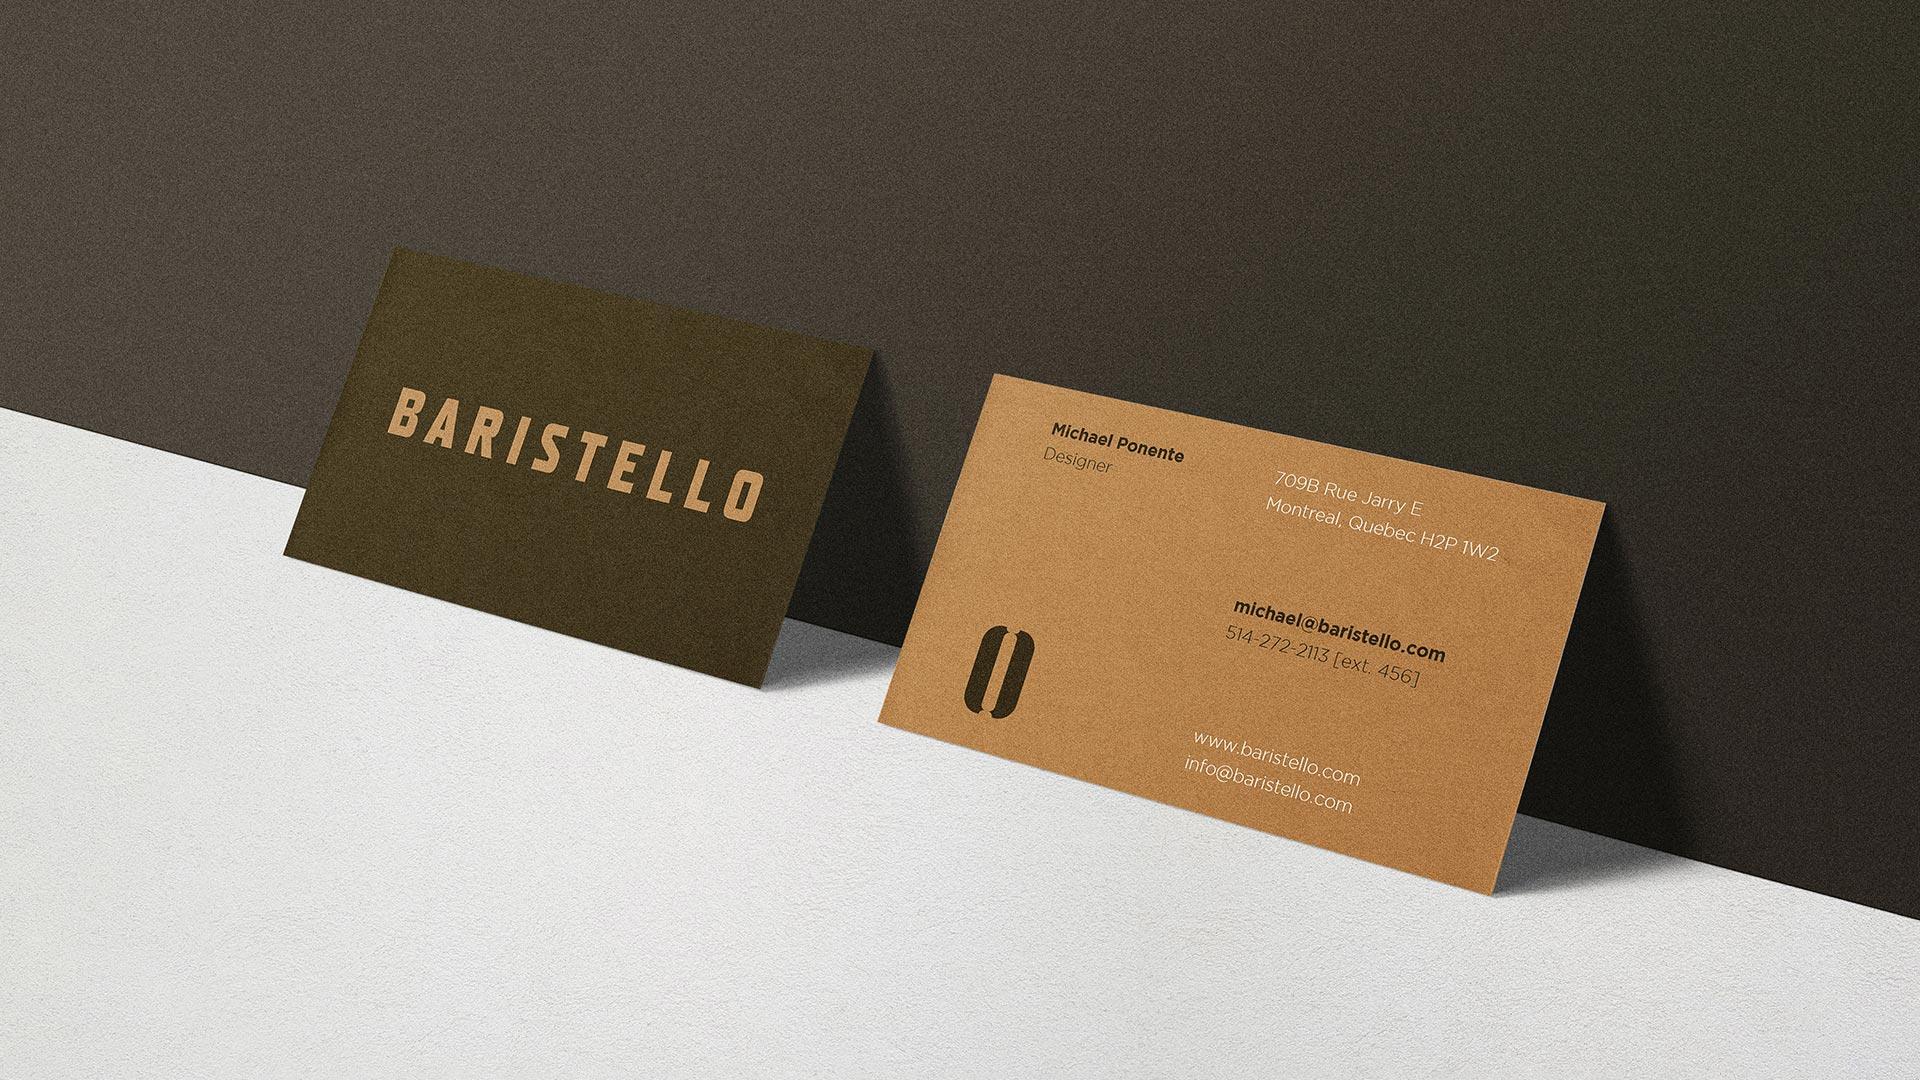 Baristello Coffee Shop Rebranding